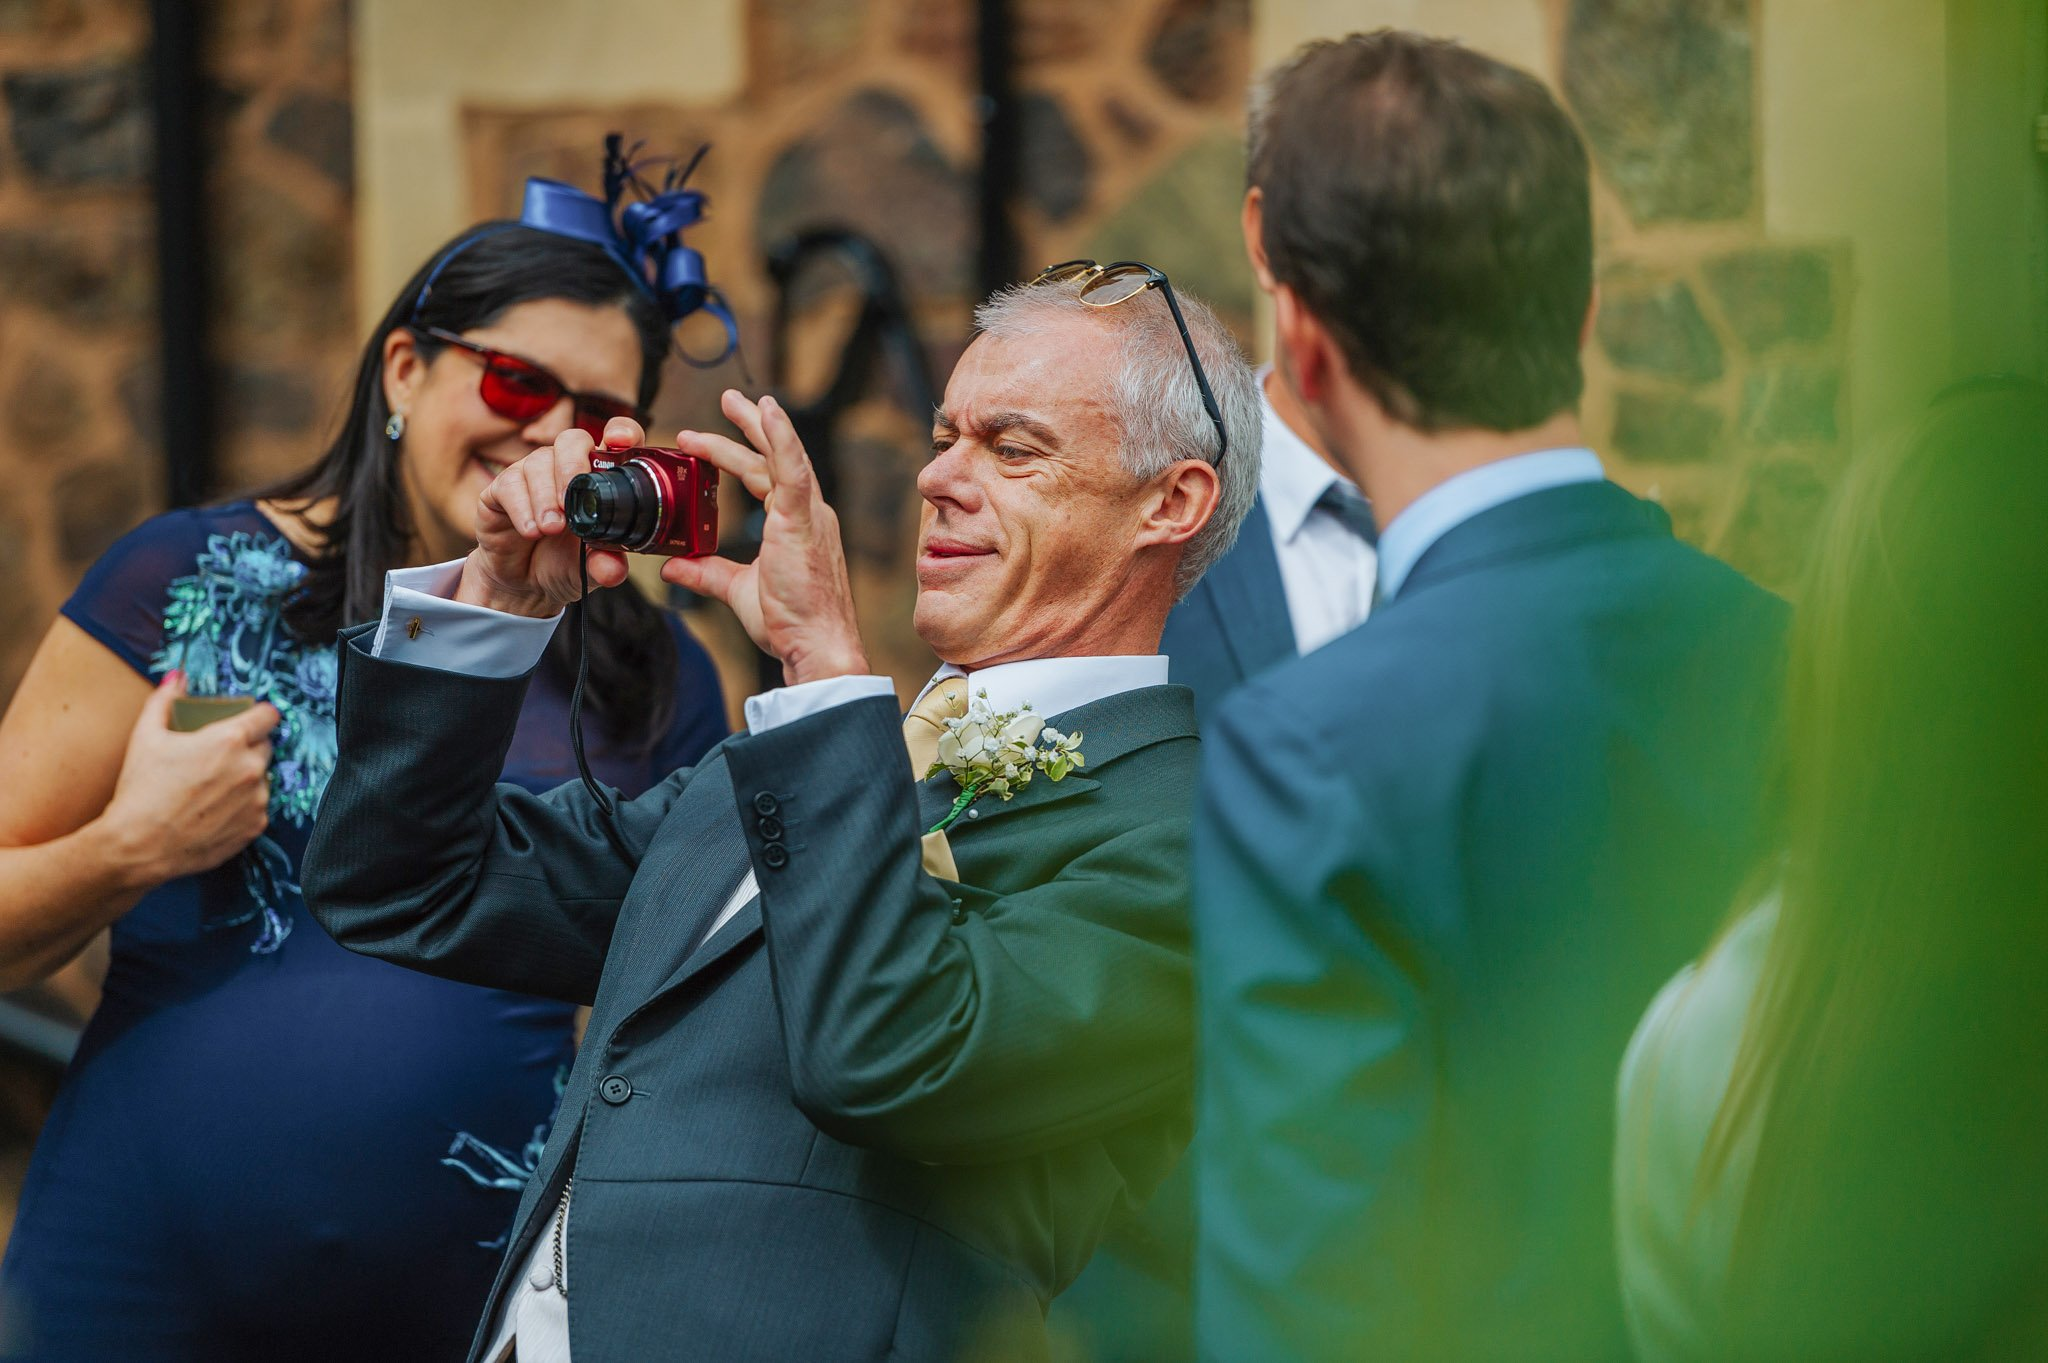 Georgina + Mike - Wedding photography in Malvern, Worcestershire 30